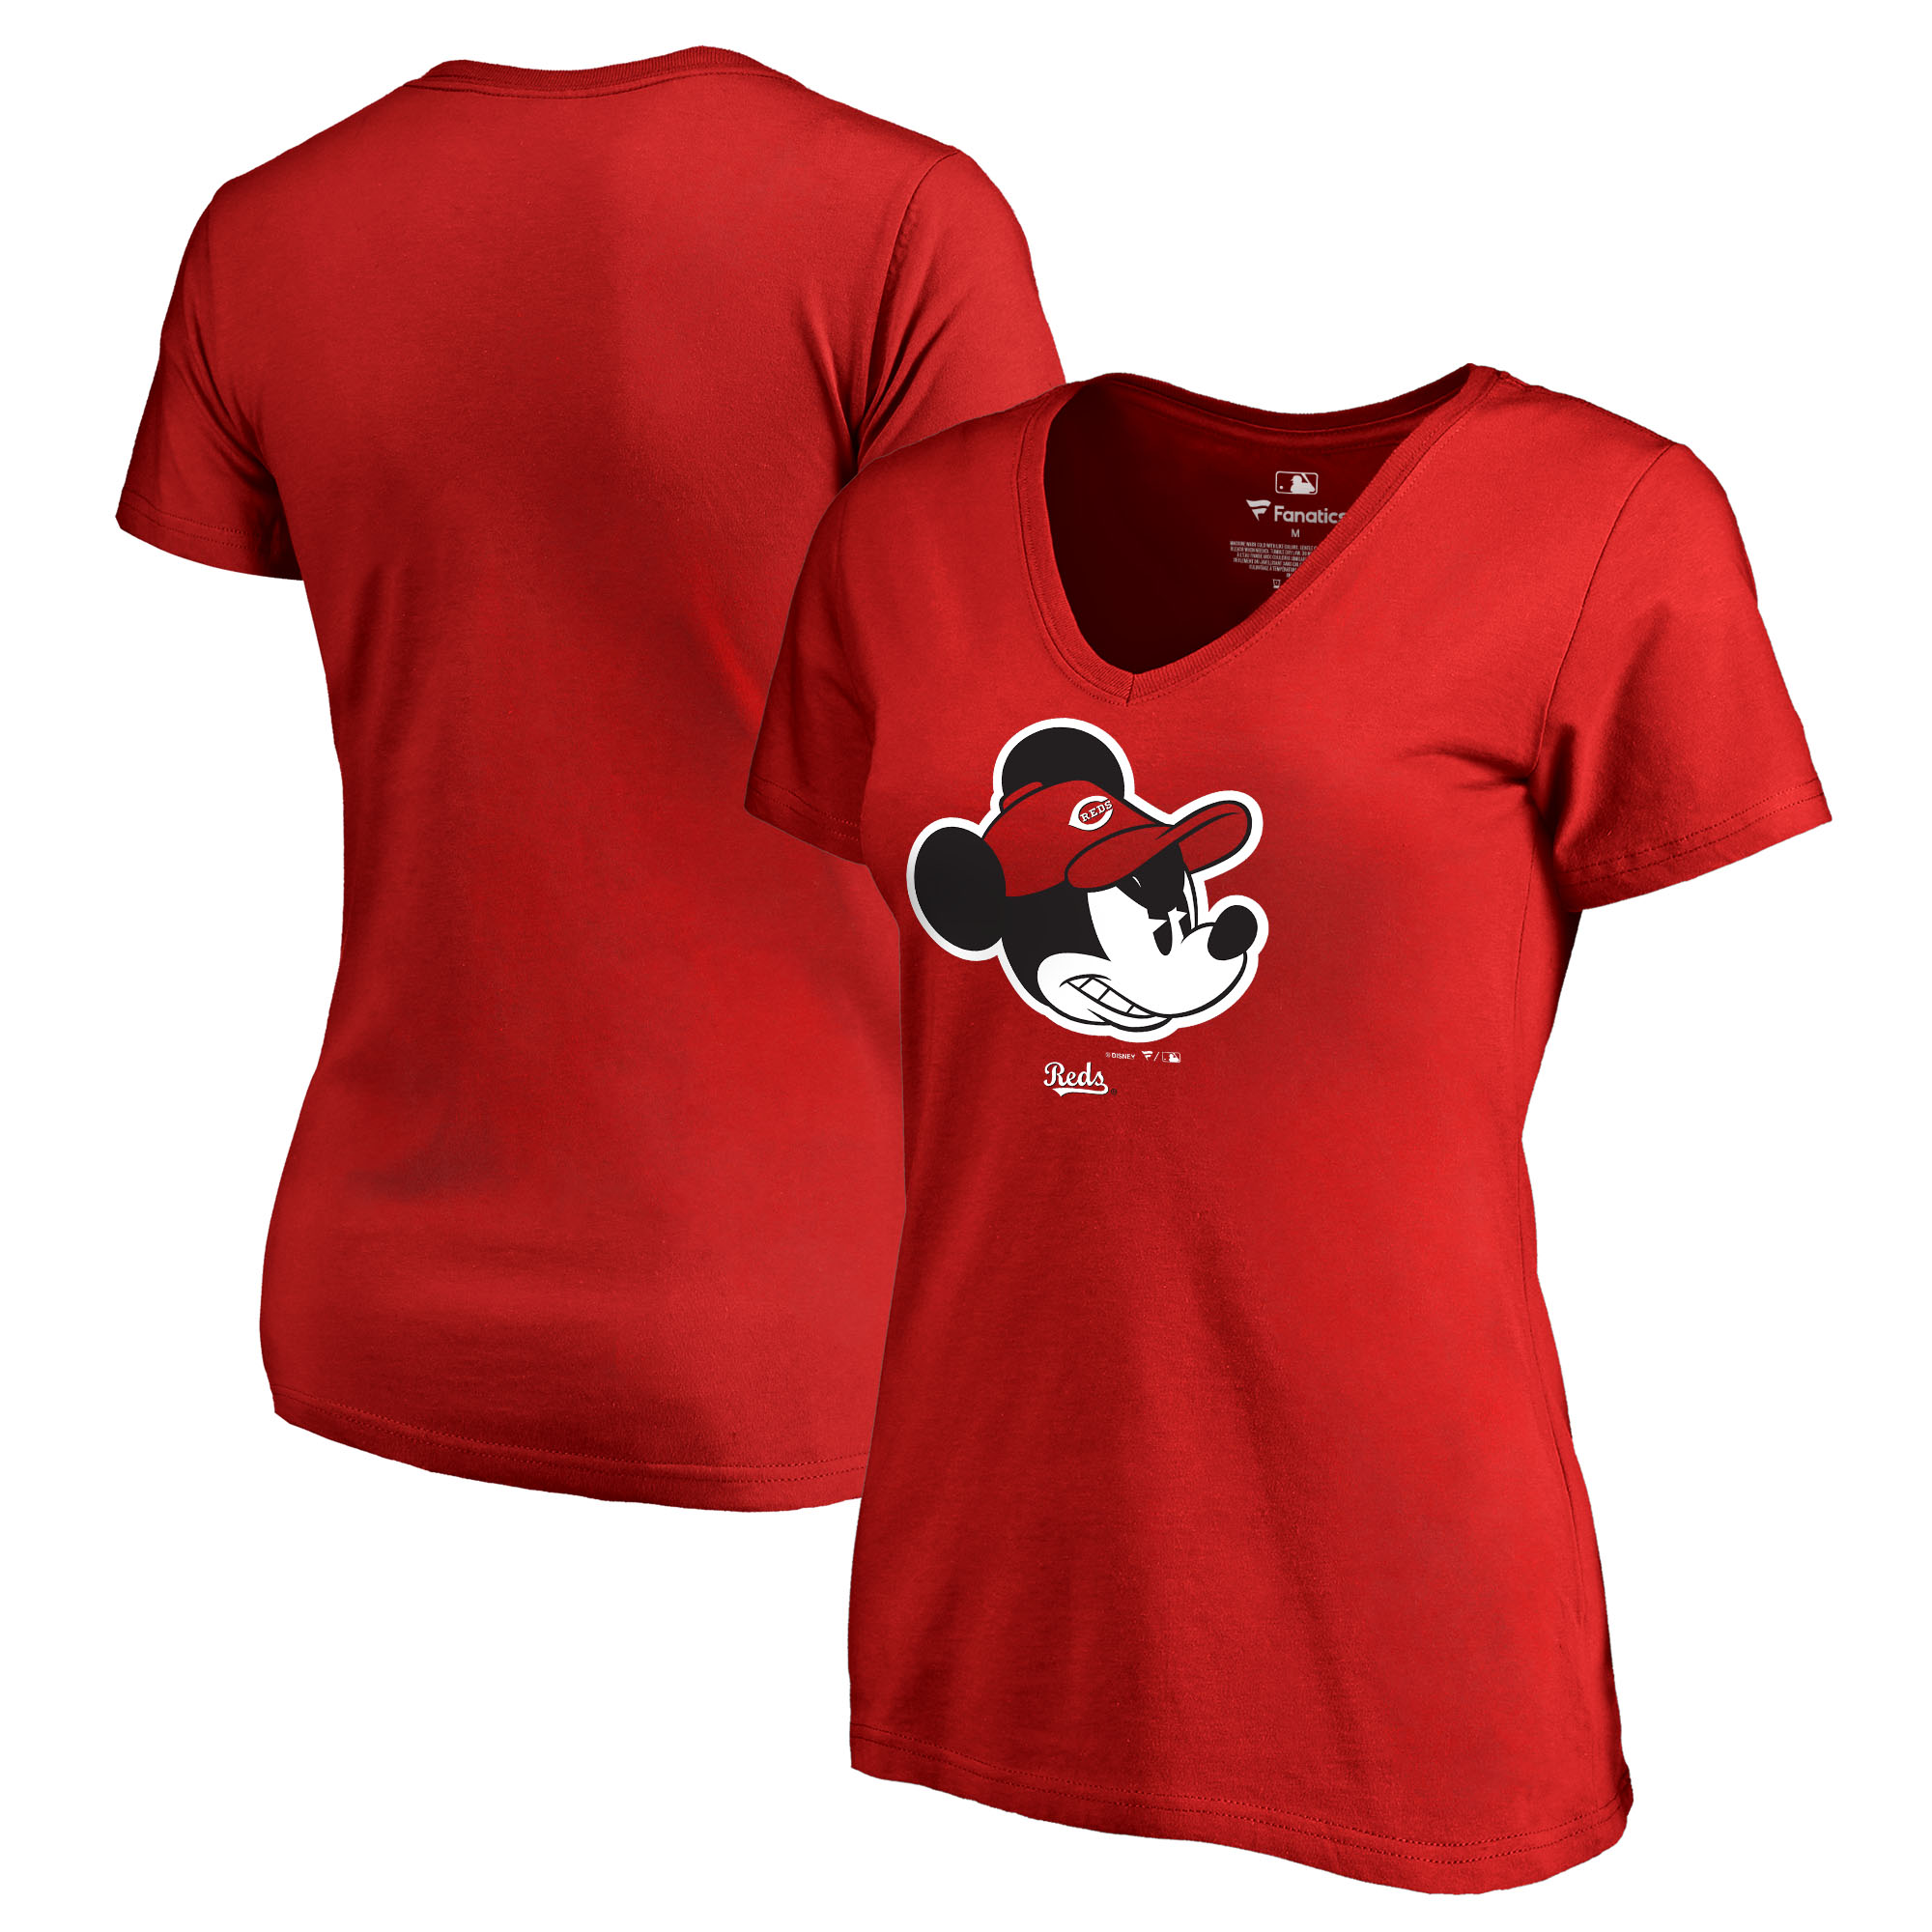 Cincinnati Reds Fanatics Branded Women's Disney Game Face V-Neck T-Shirt - Red